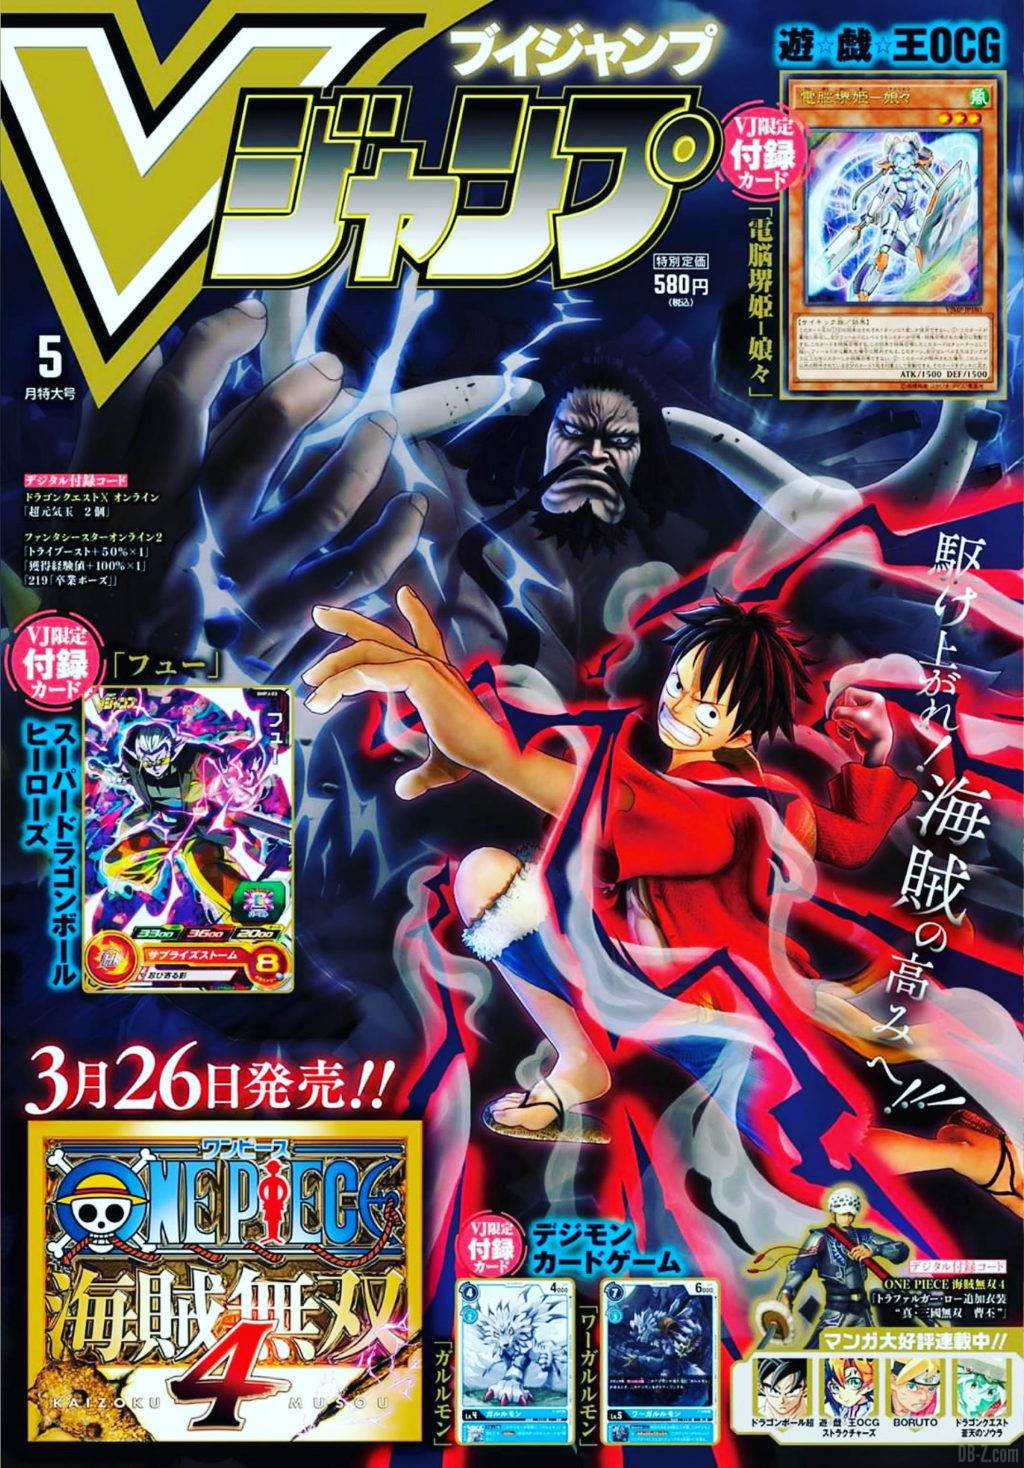 Cover V Jump Mai 2020 21 mars 2020